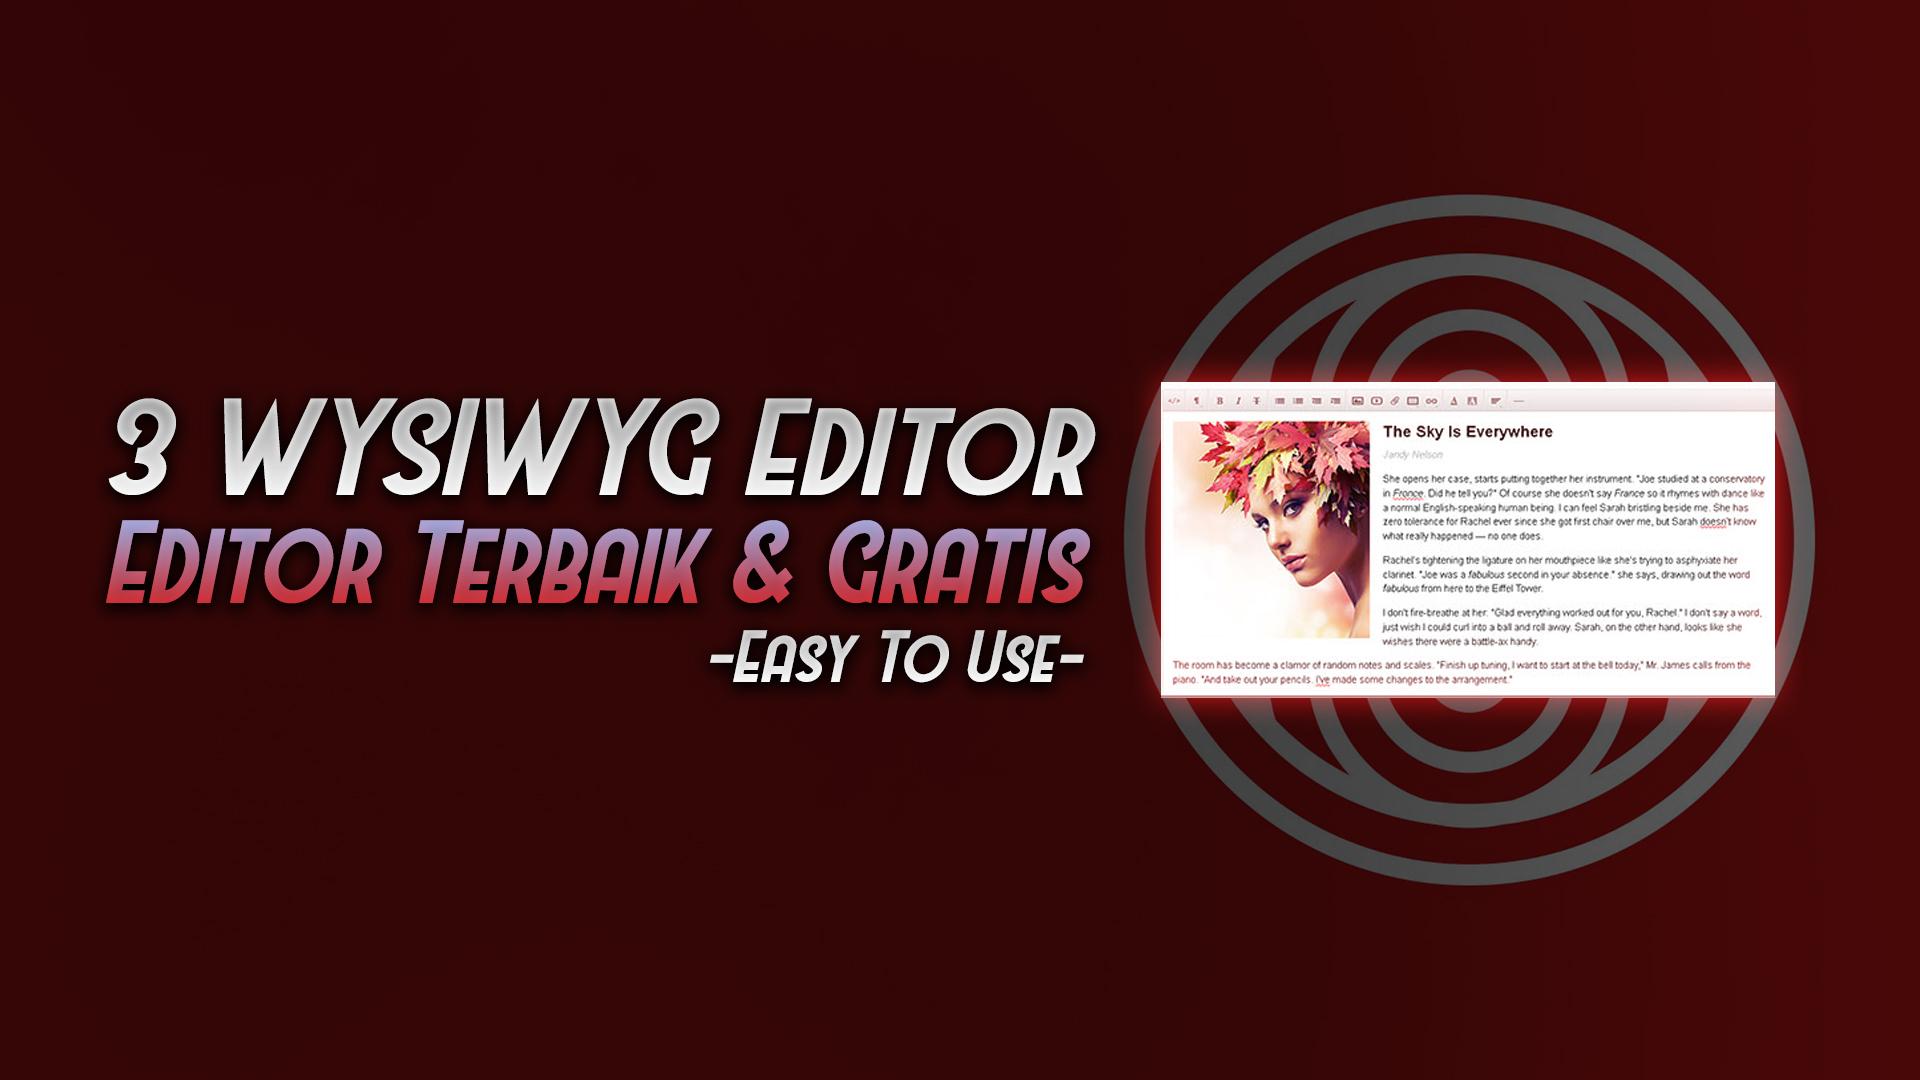 3 wysiwyg editor html terbaik gratis - rio bermano